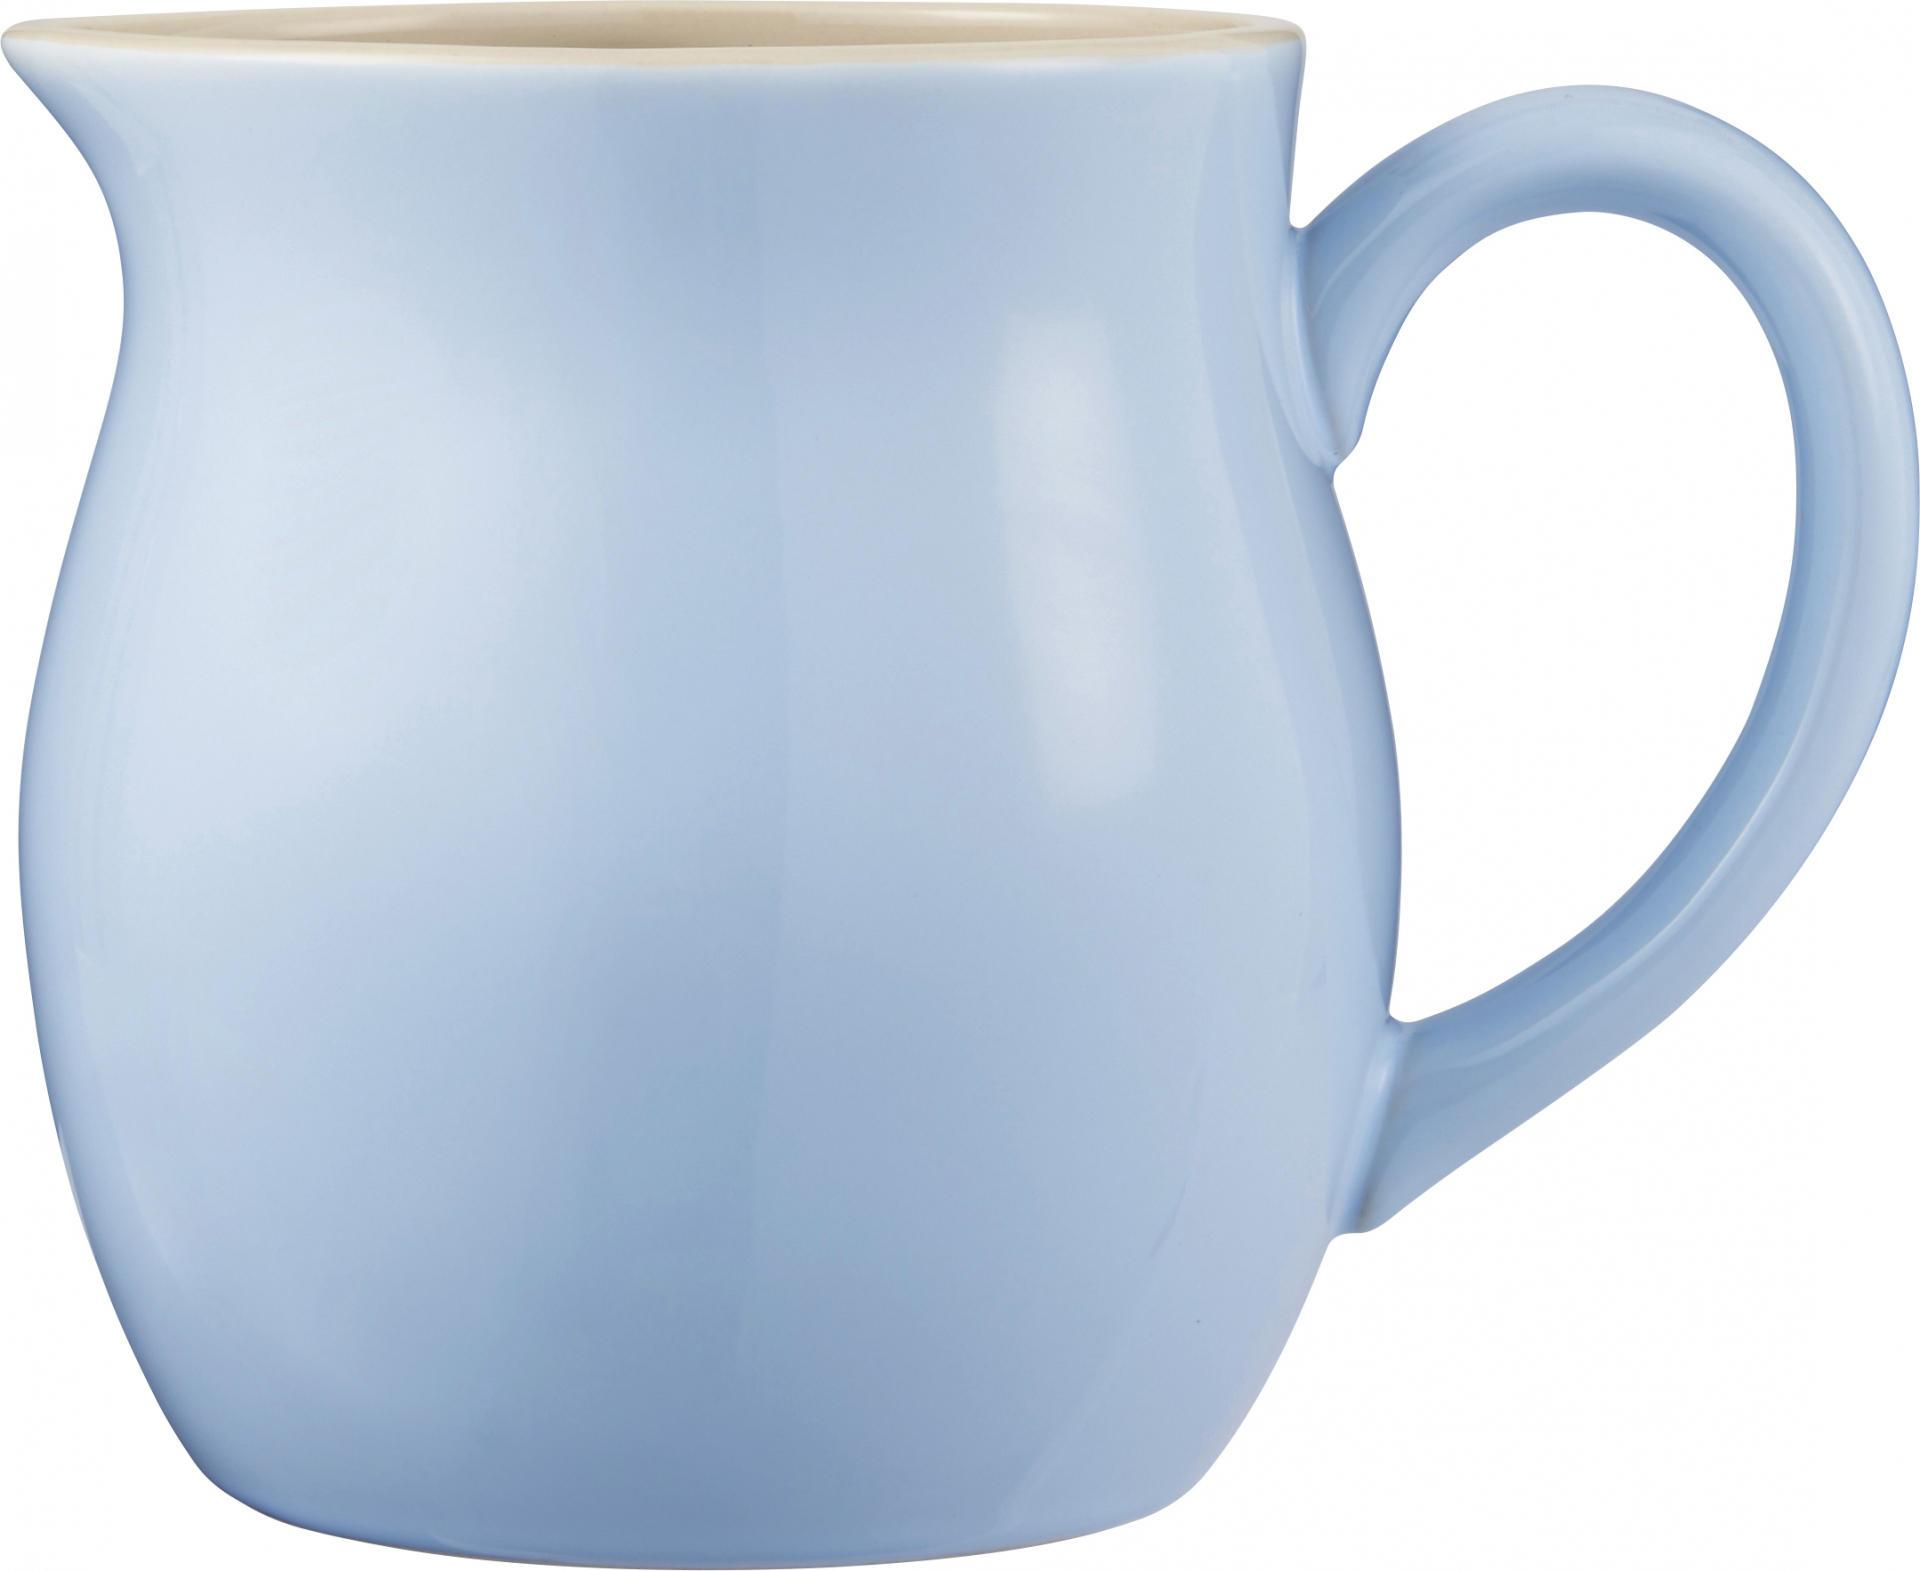 IB LAURSEN Džbán Mynte Nordic Sky 2,5 L, modrá barva, keramika